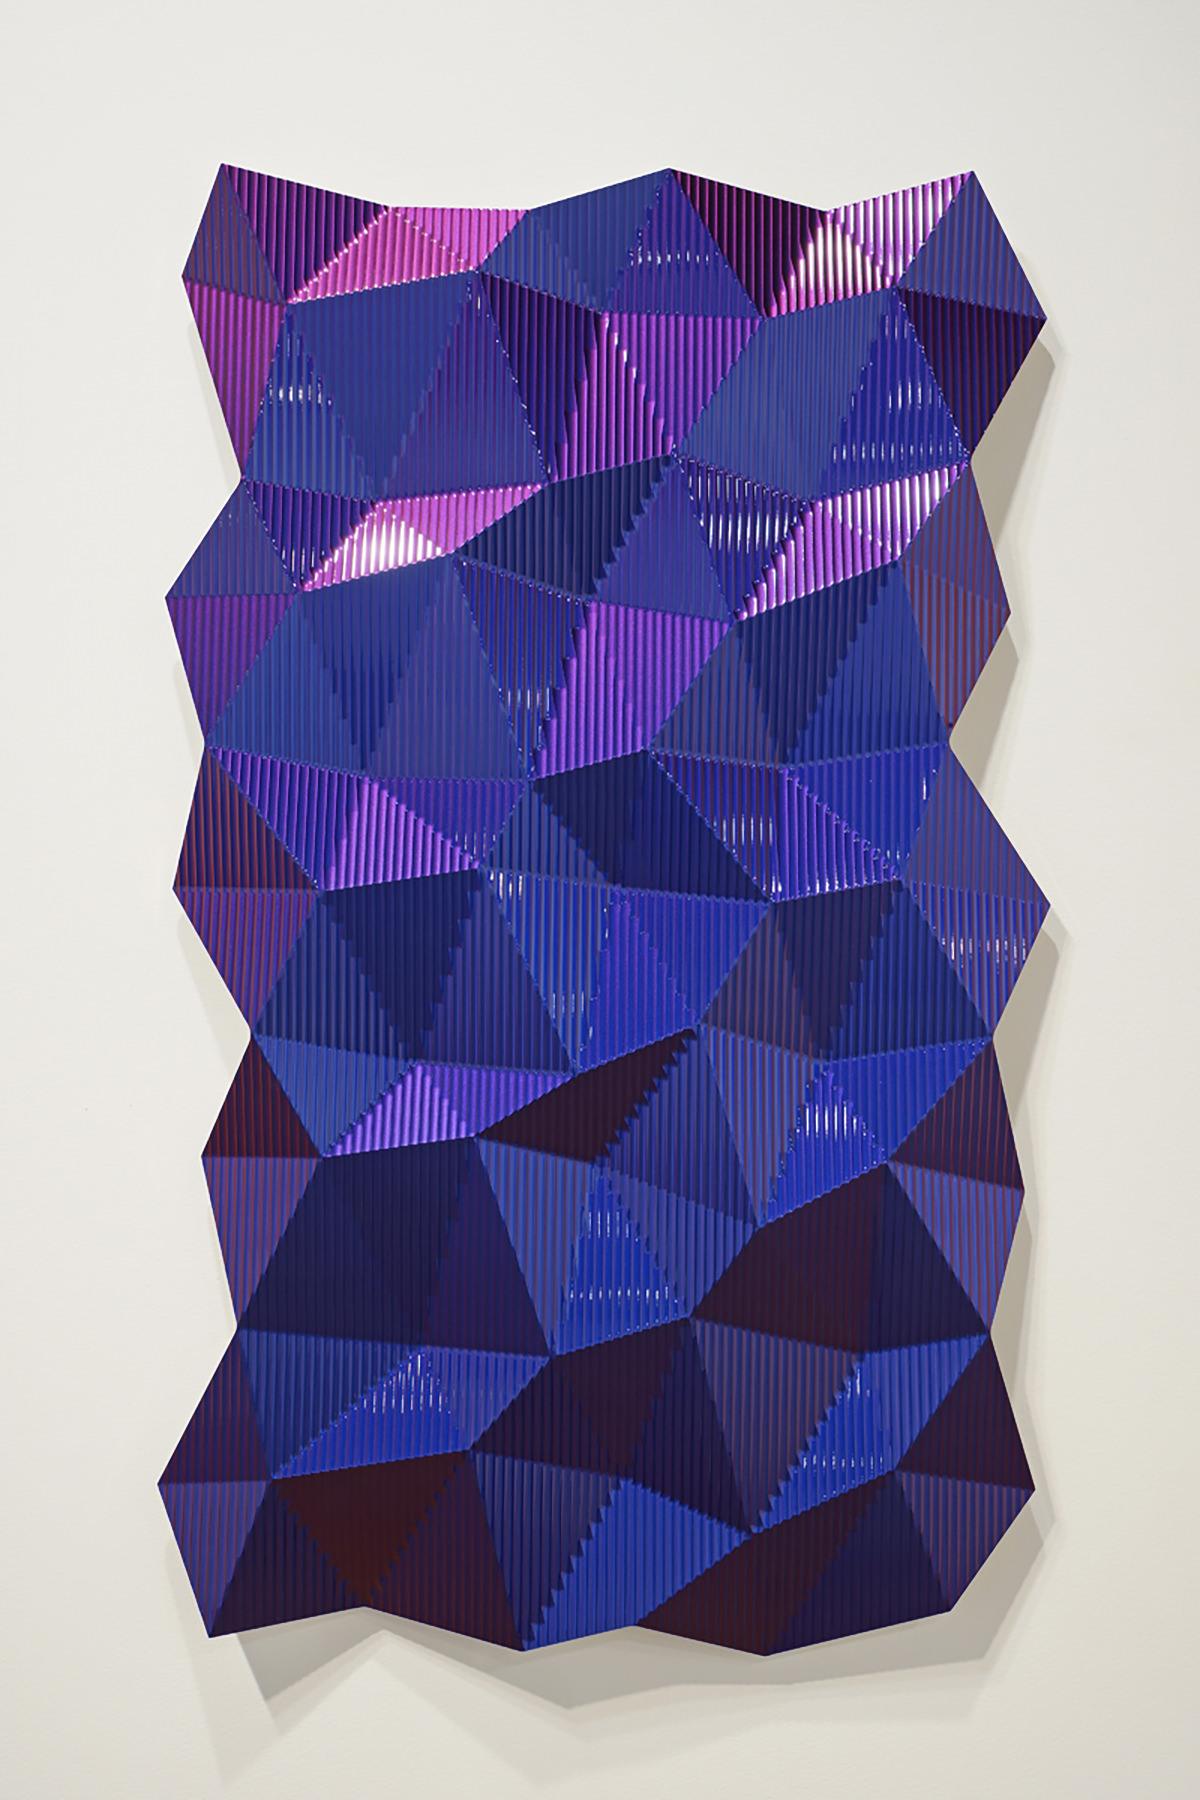 Hexagonal Perturbation- Blue/Red